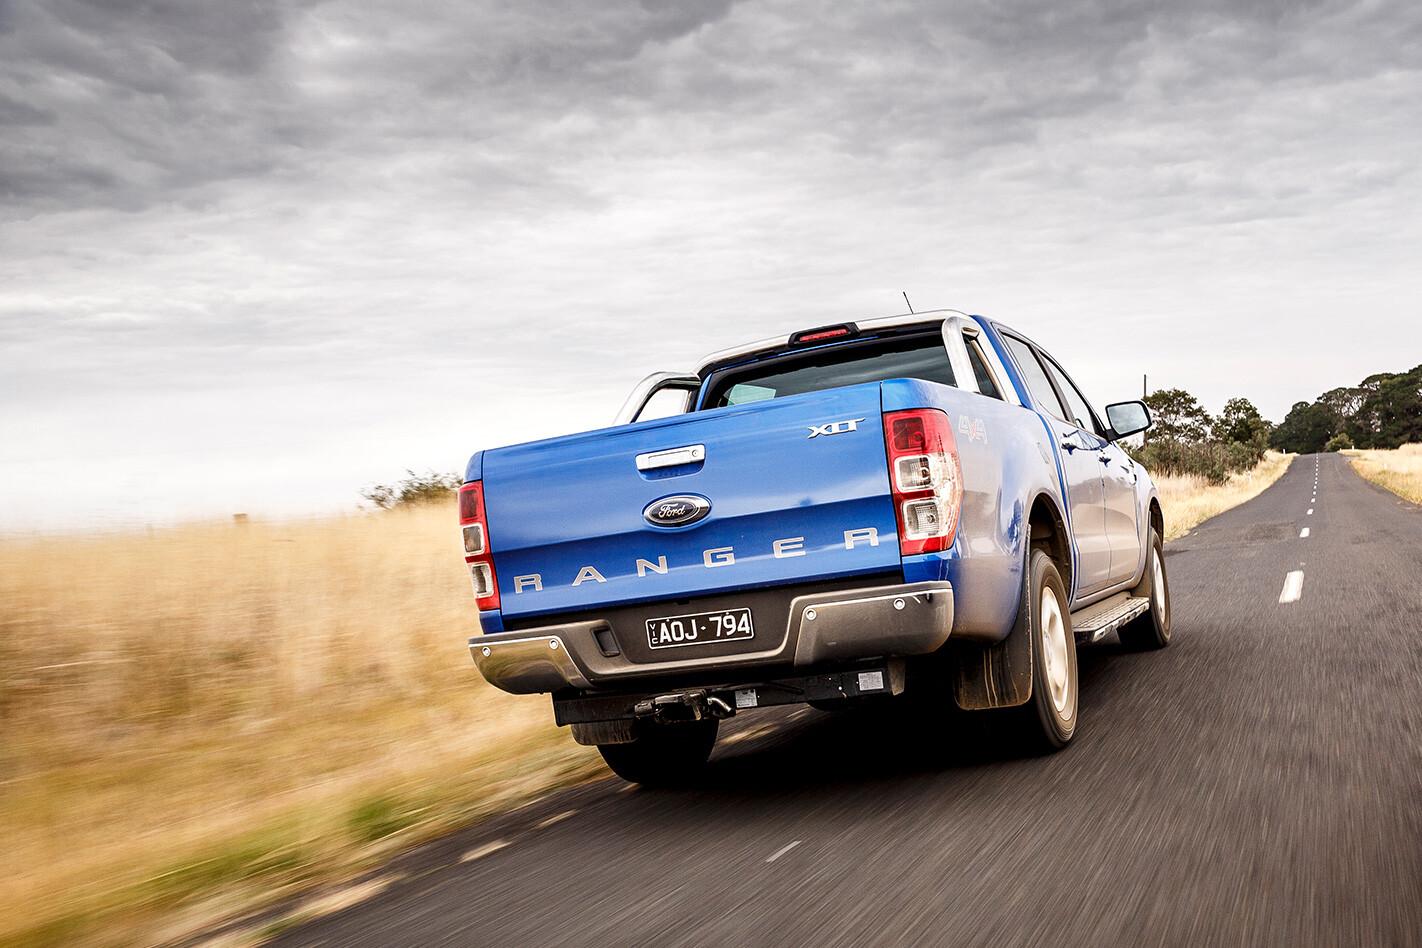 Ford Merc Ranger Rear Trackin Jpg